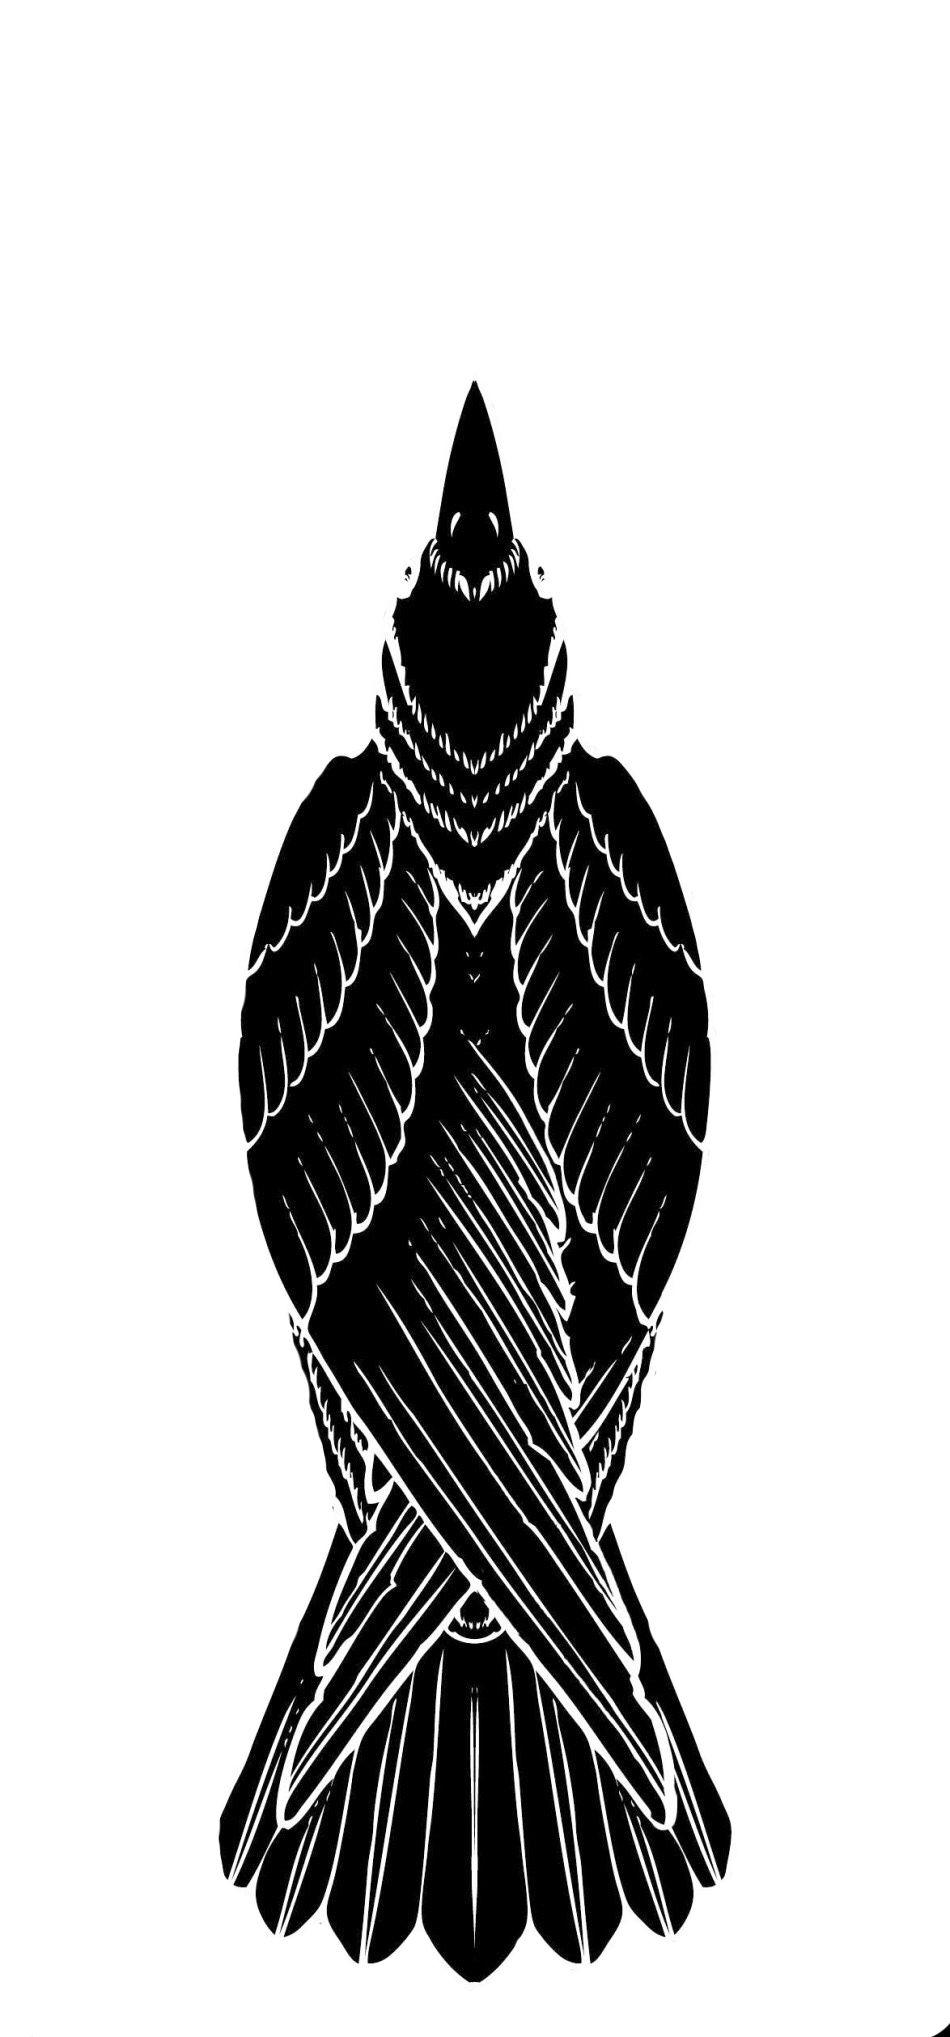 Raven Tattoo (Black on White Background)